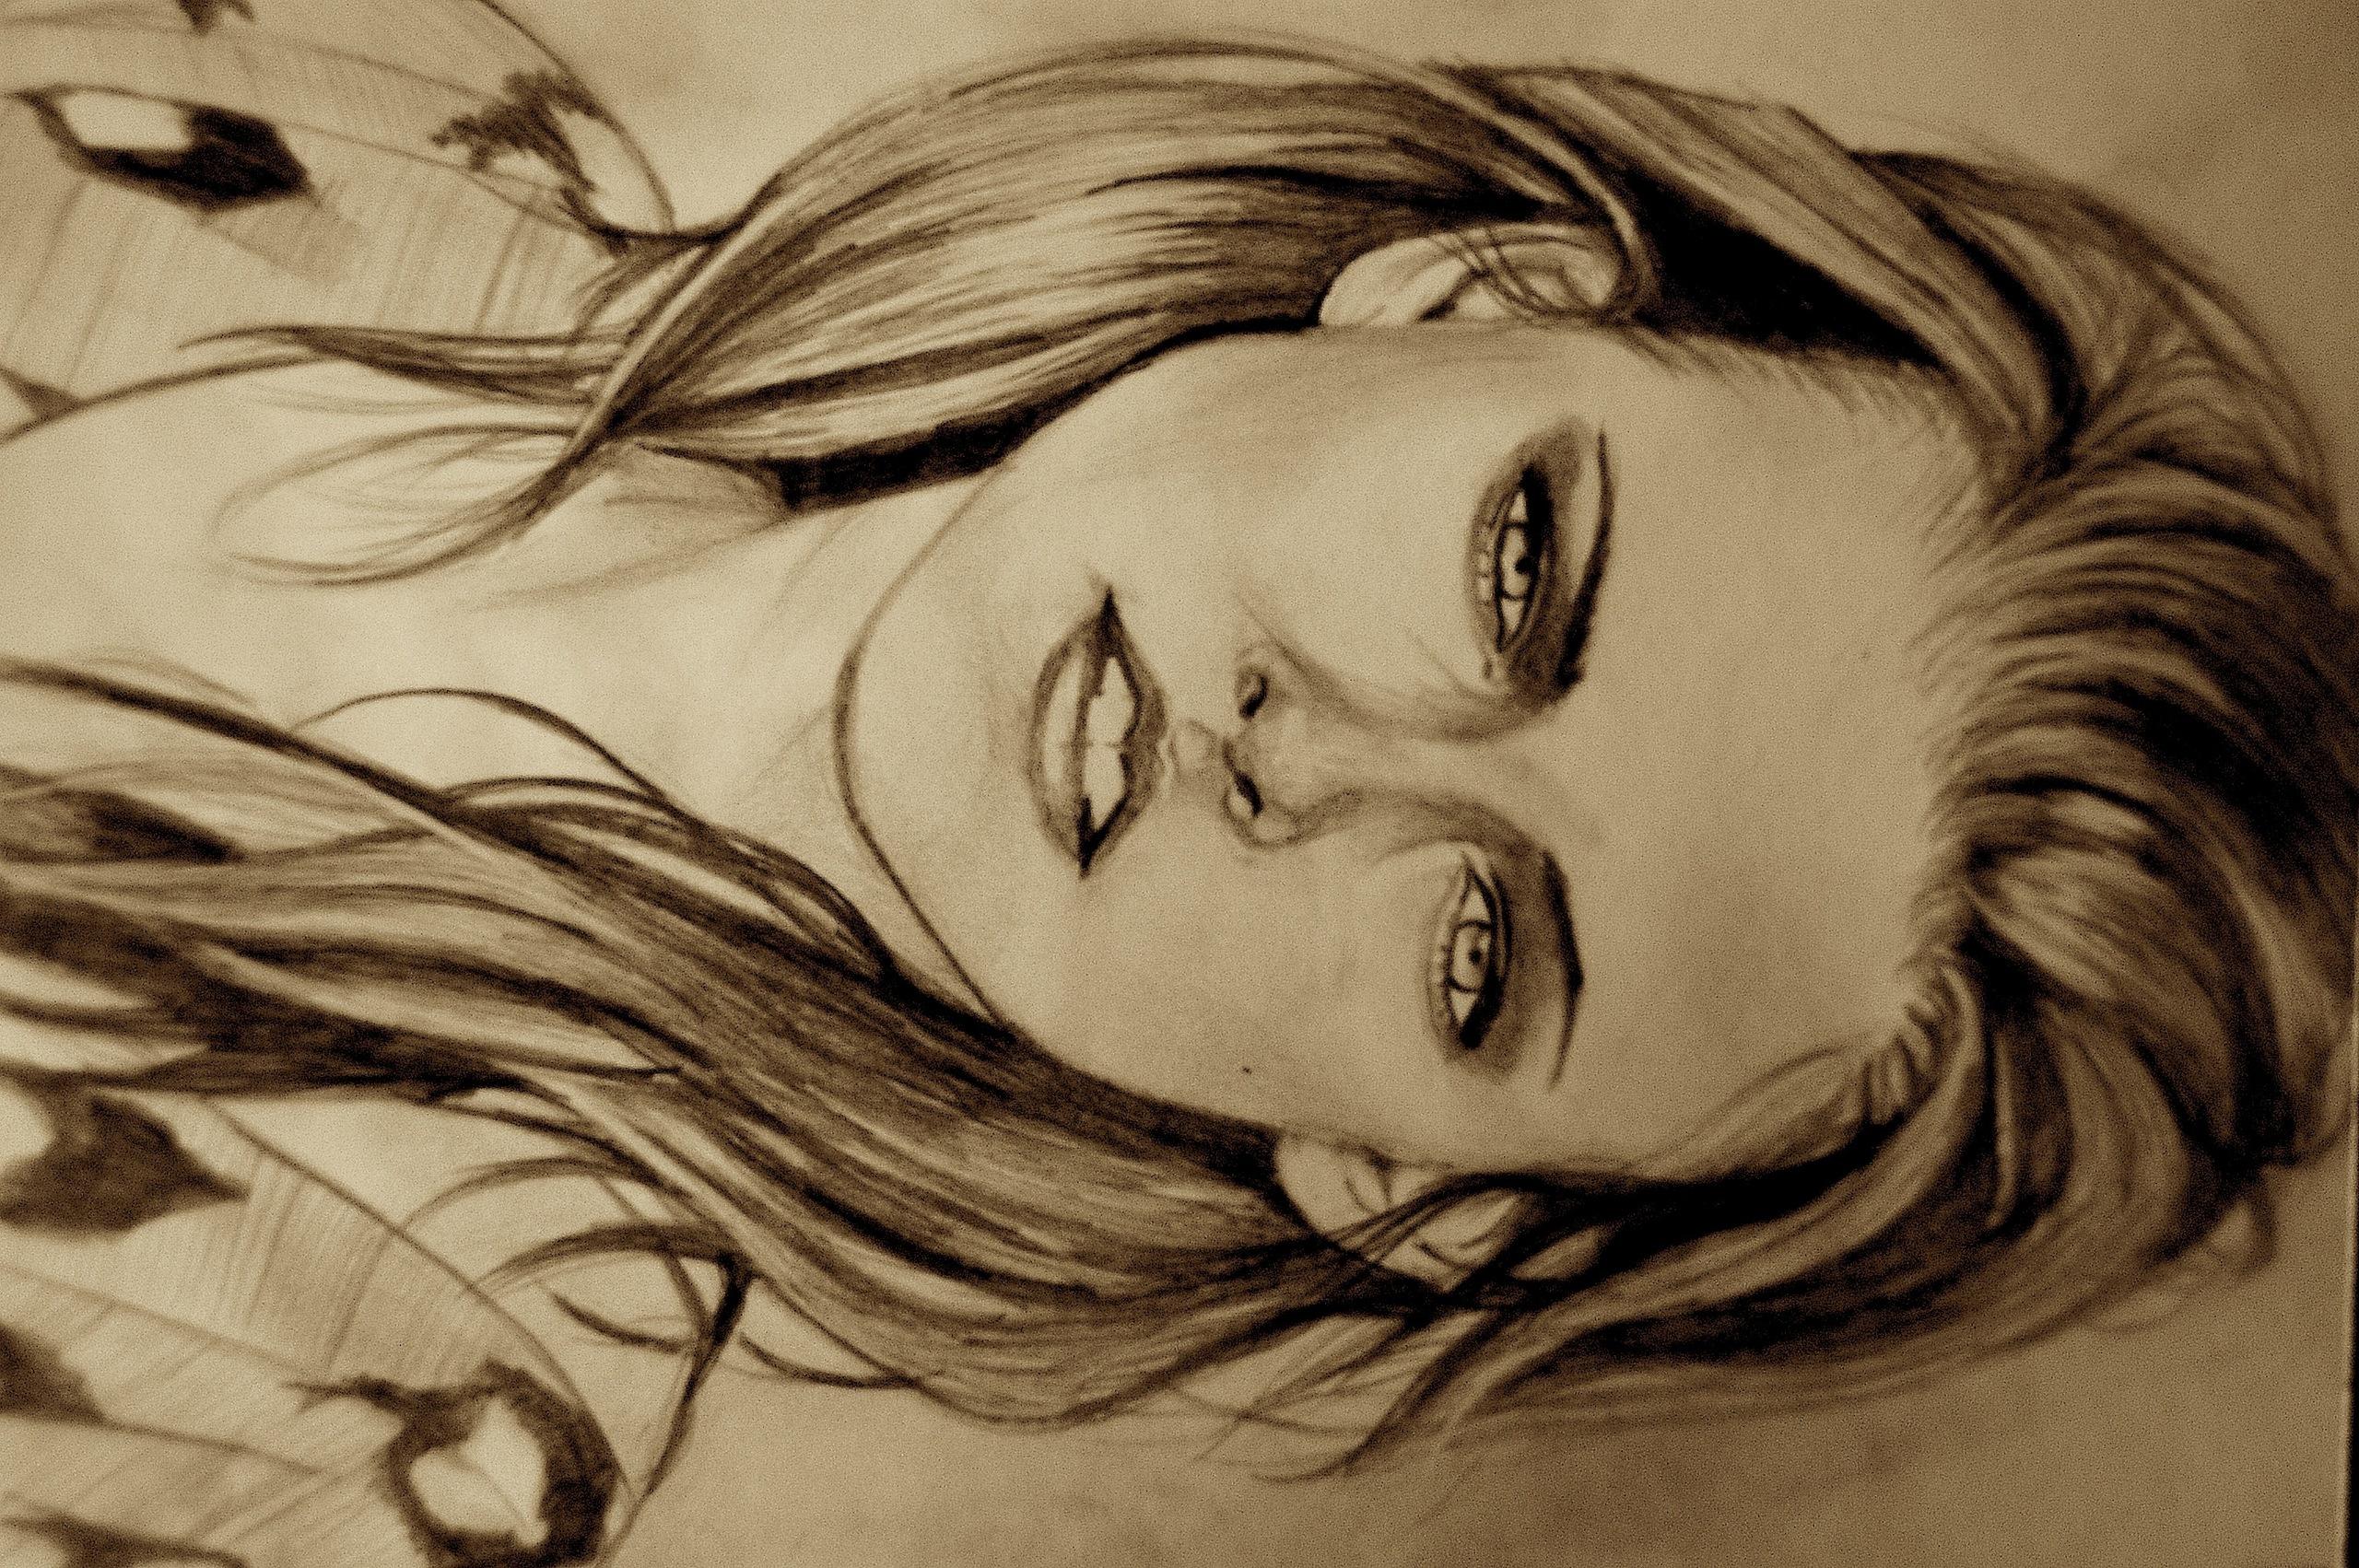 Drawing of Kristen Stewart